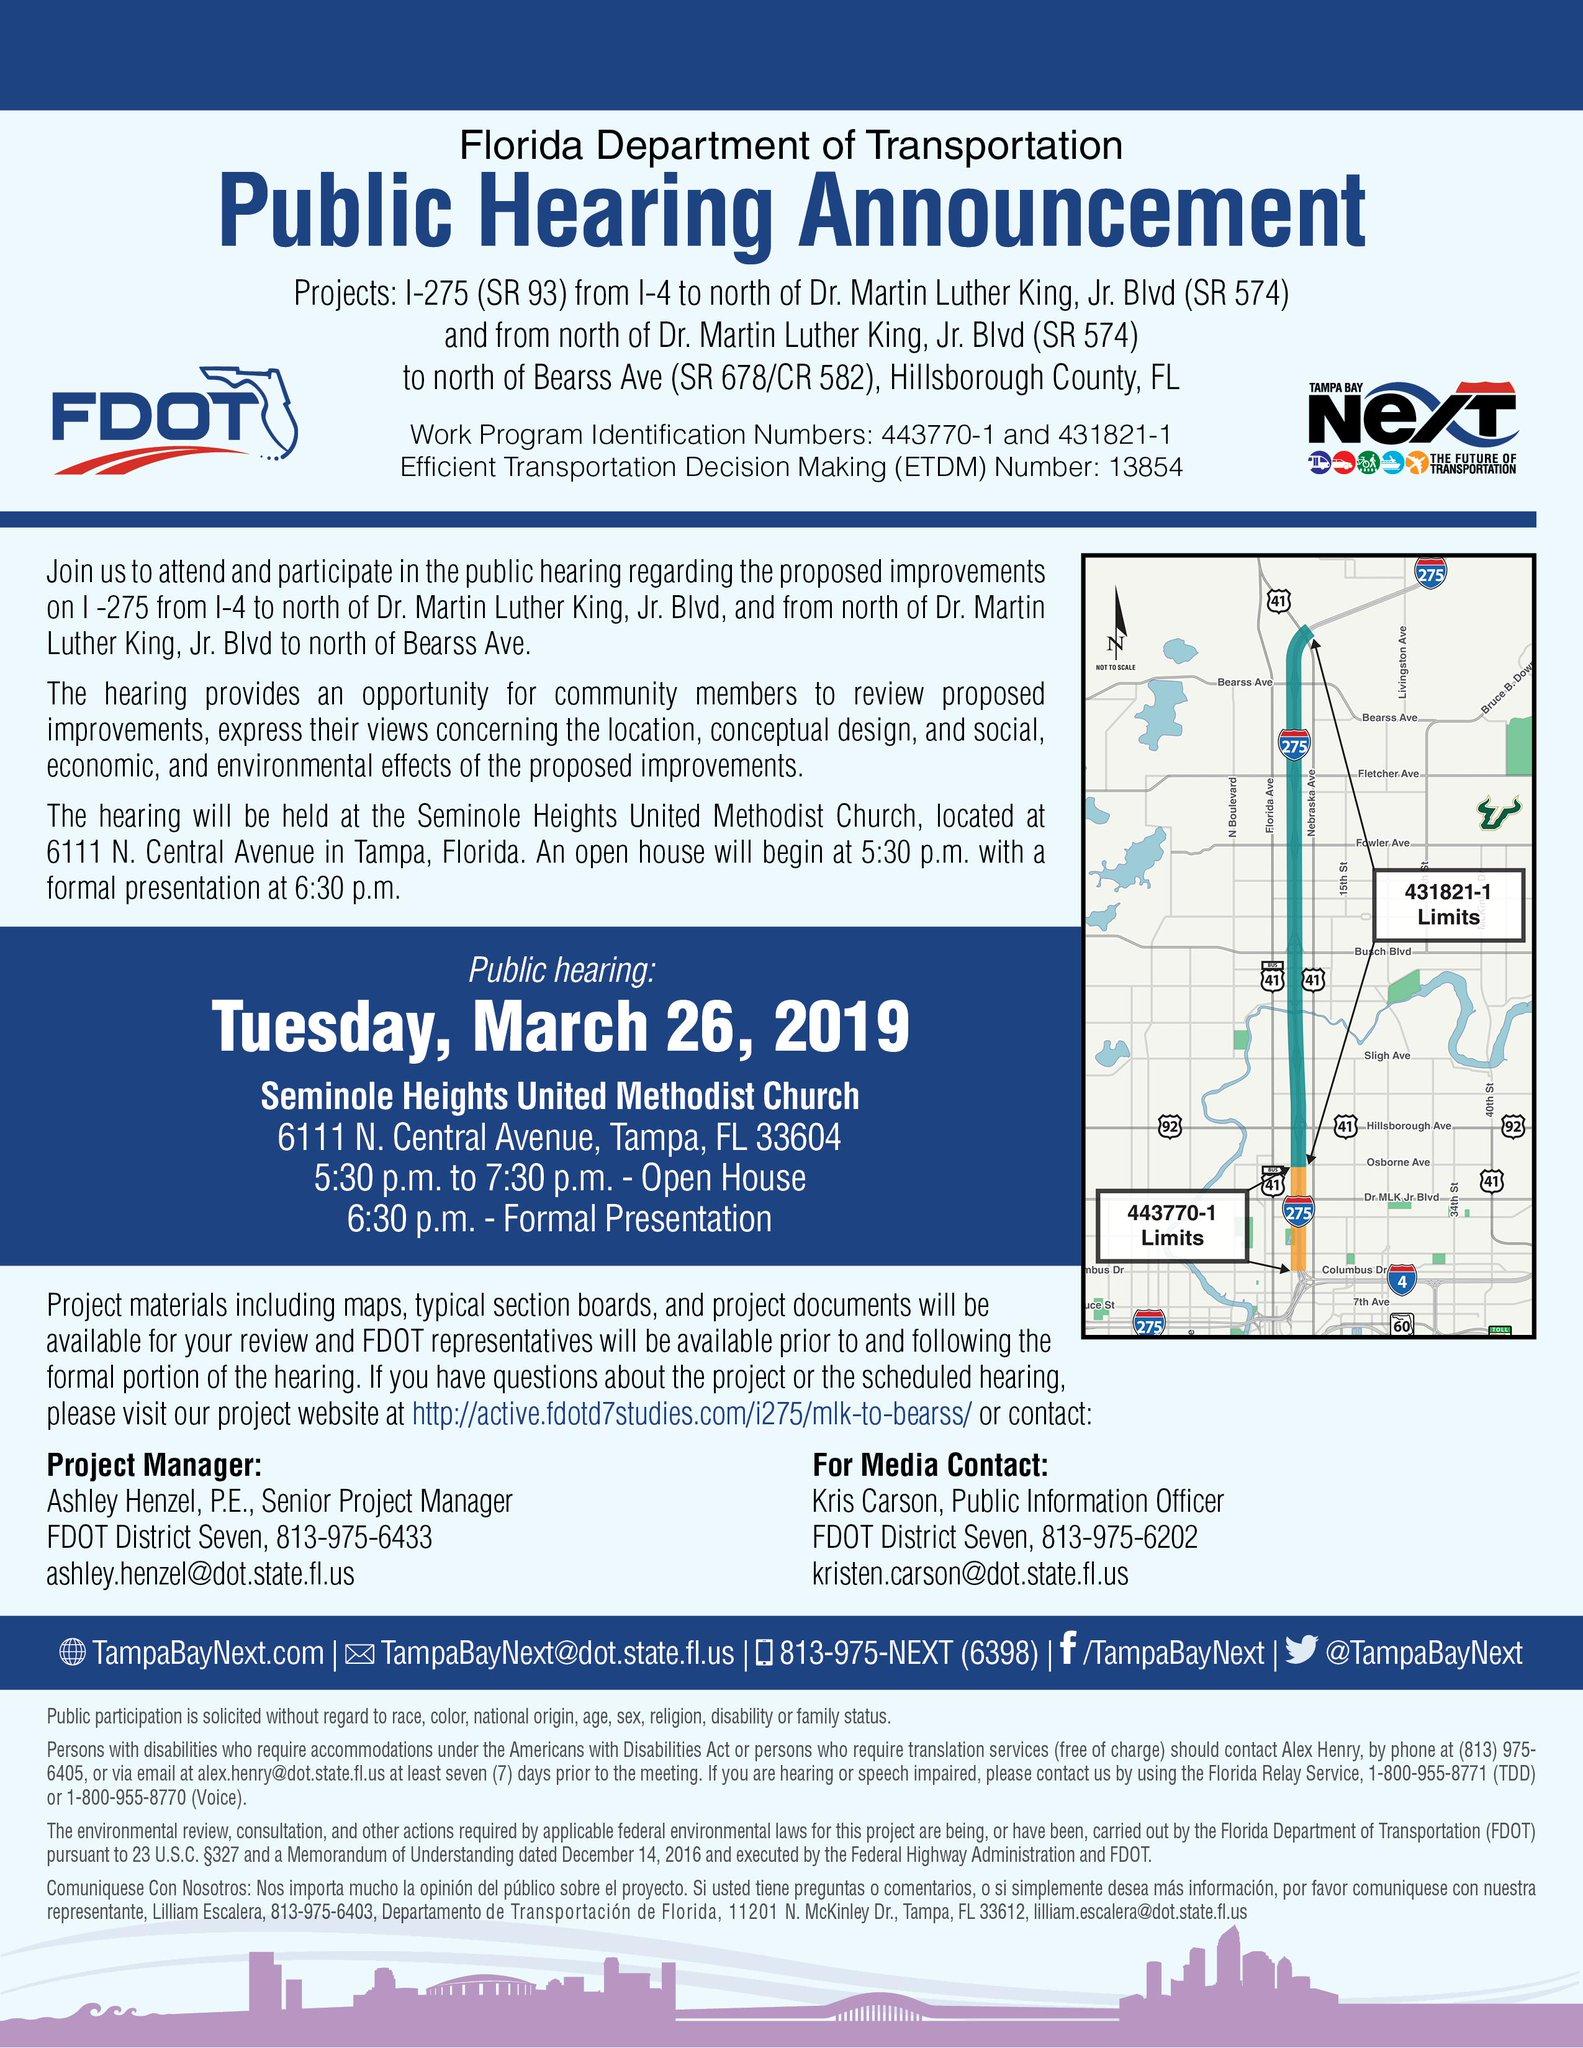 Tampa Bay Next, TBX, FDOT